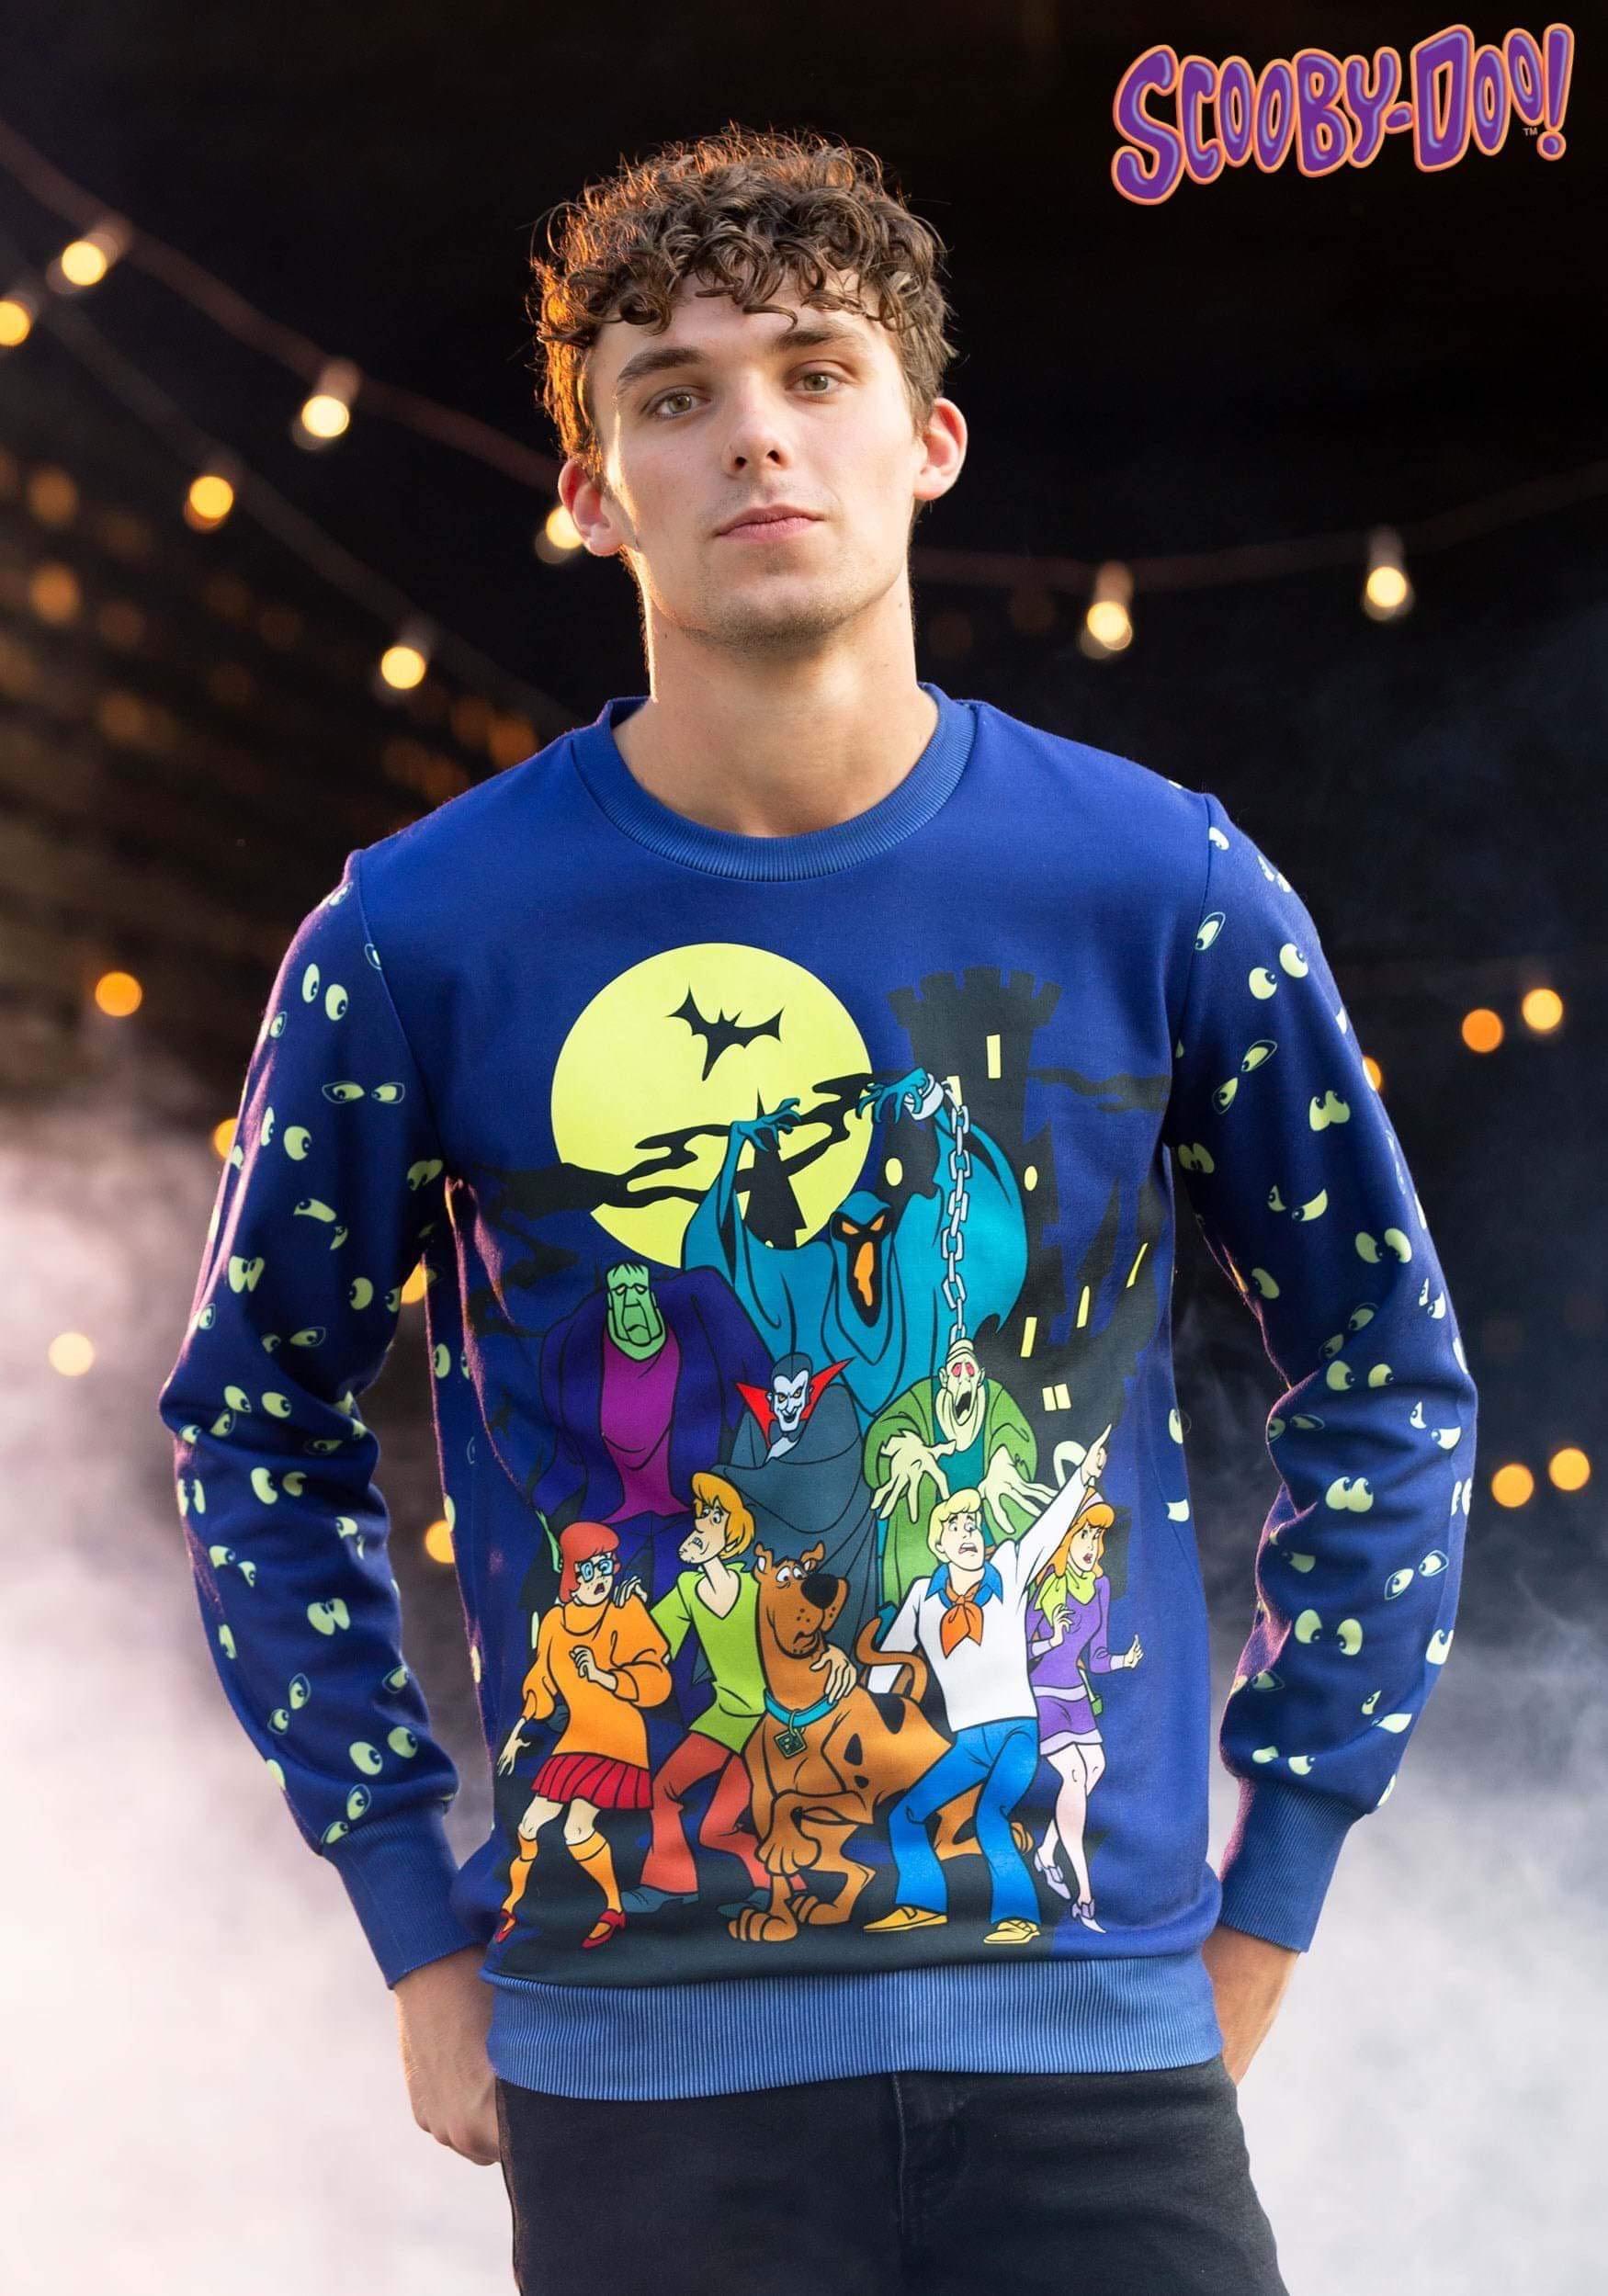 Scooby Doo Sweater from HalloweenCostumes.com